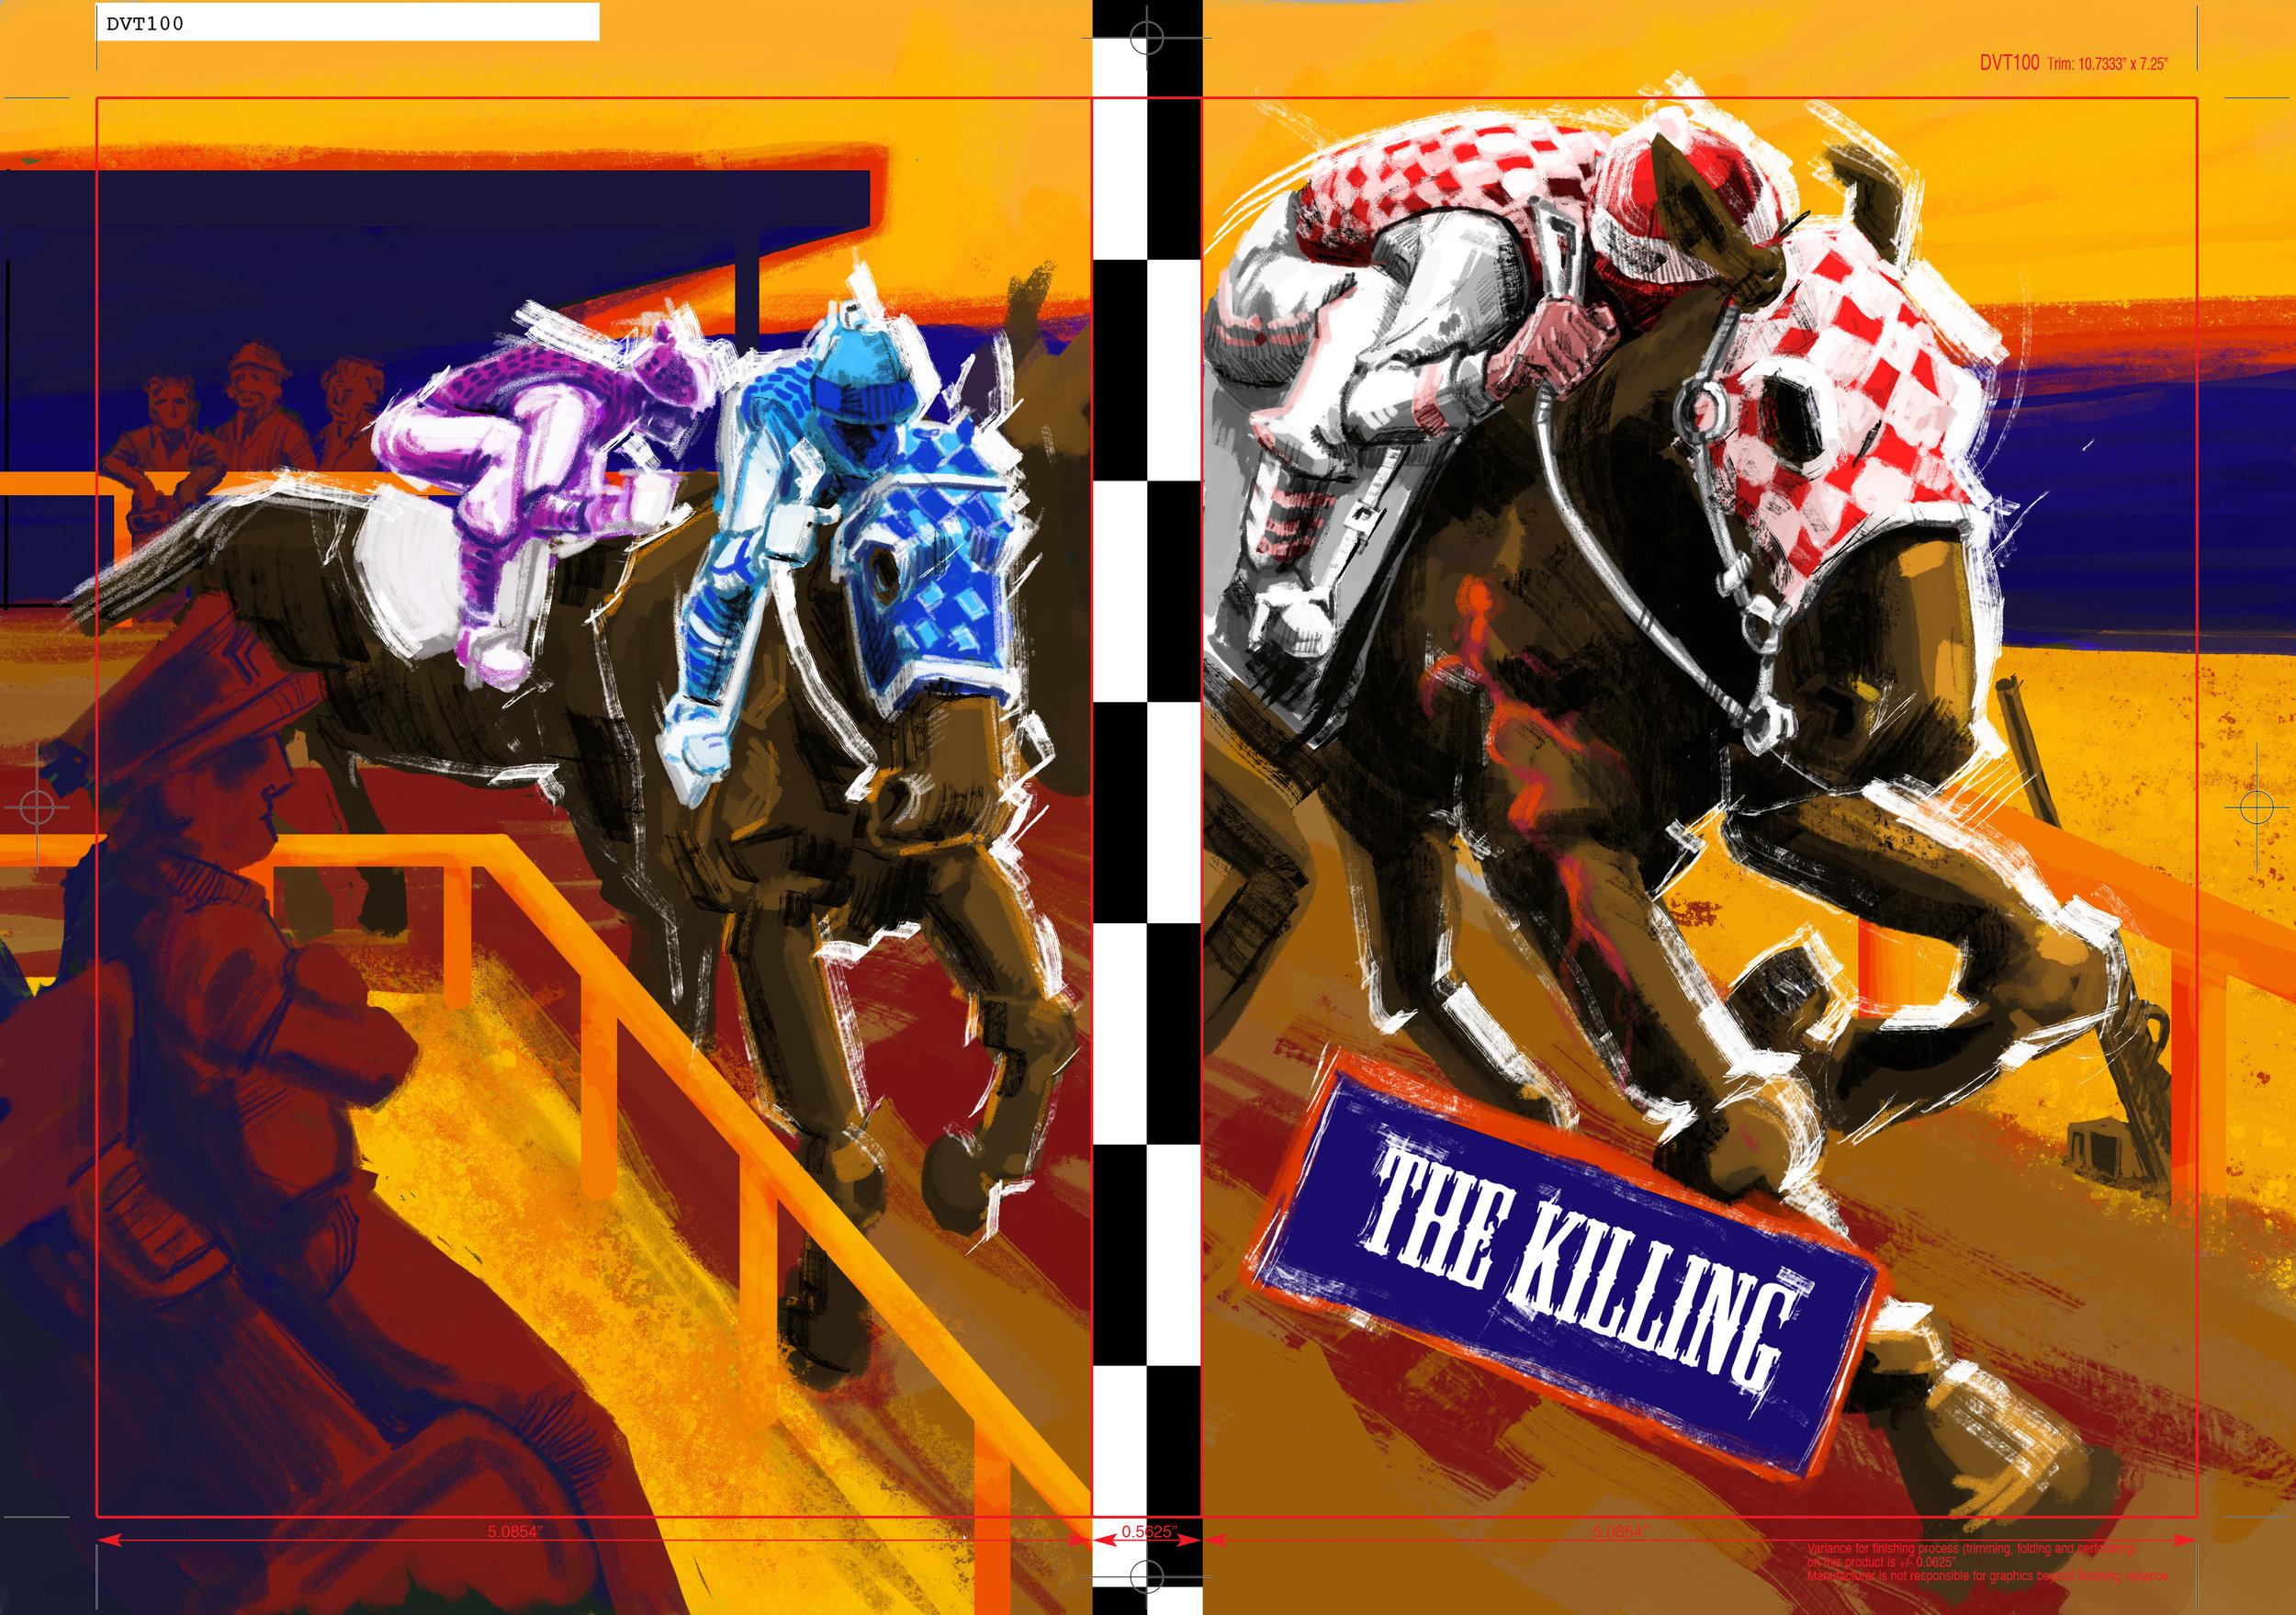 THE KILLING2.jpg